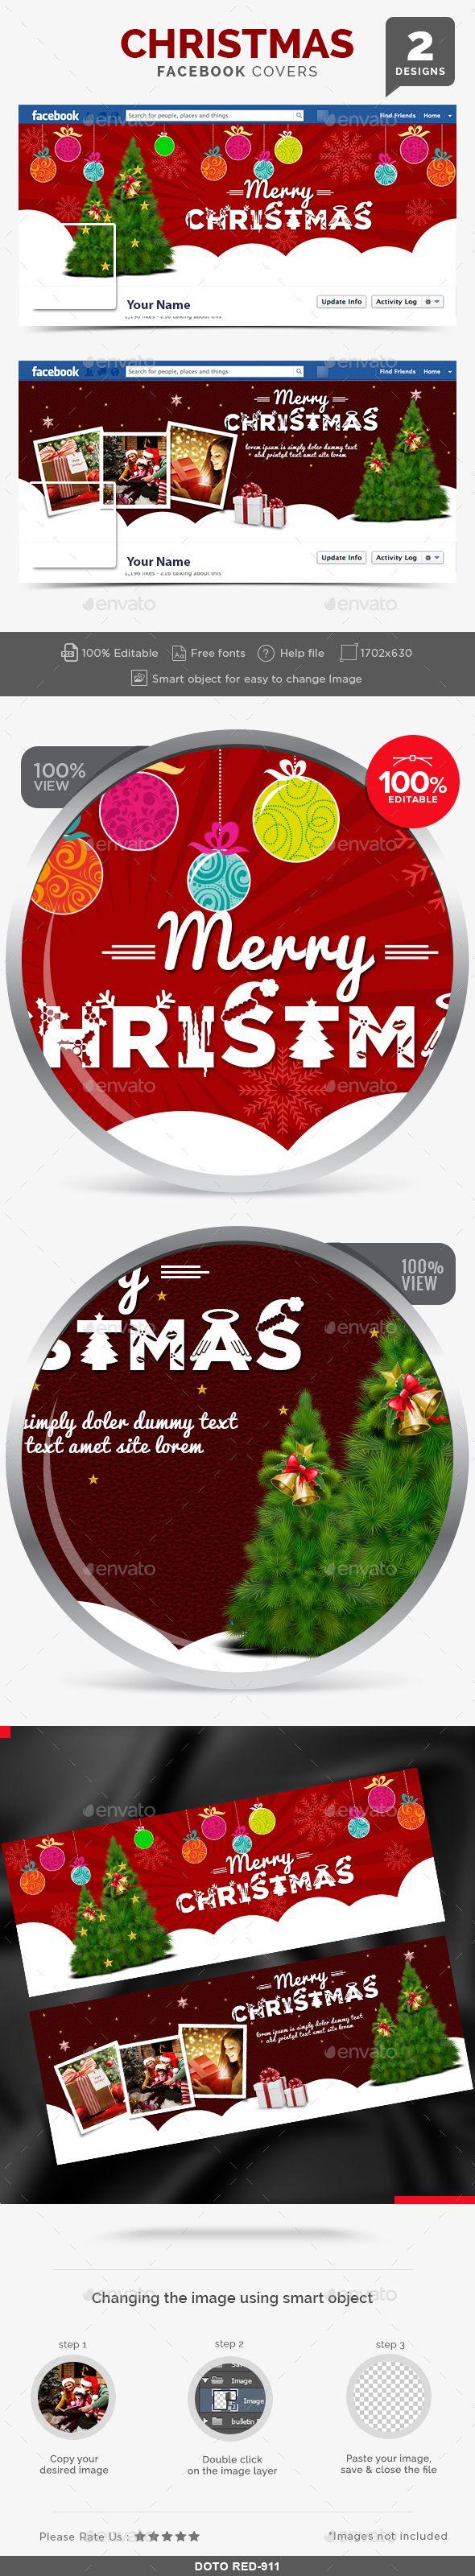 Christmas Facebook Covers 2 Designs Christmas facebook